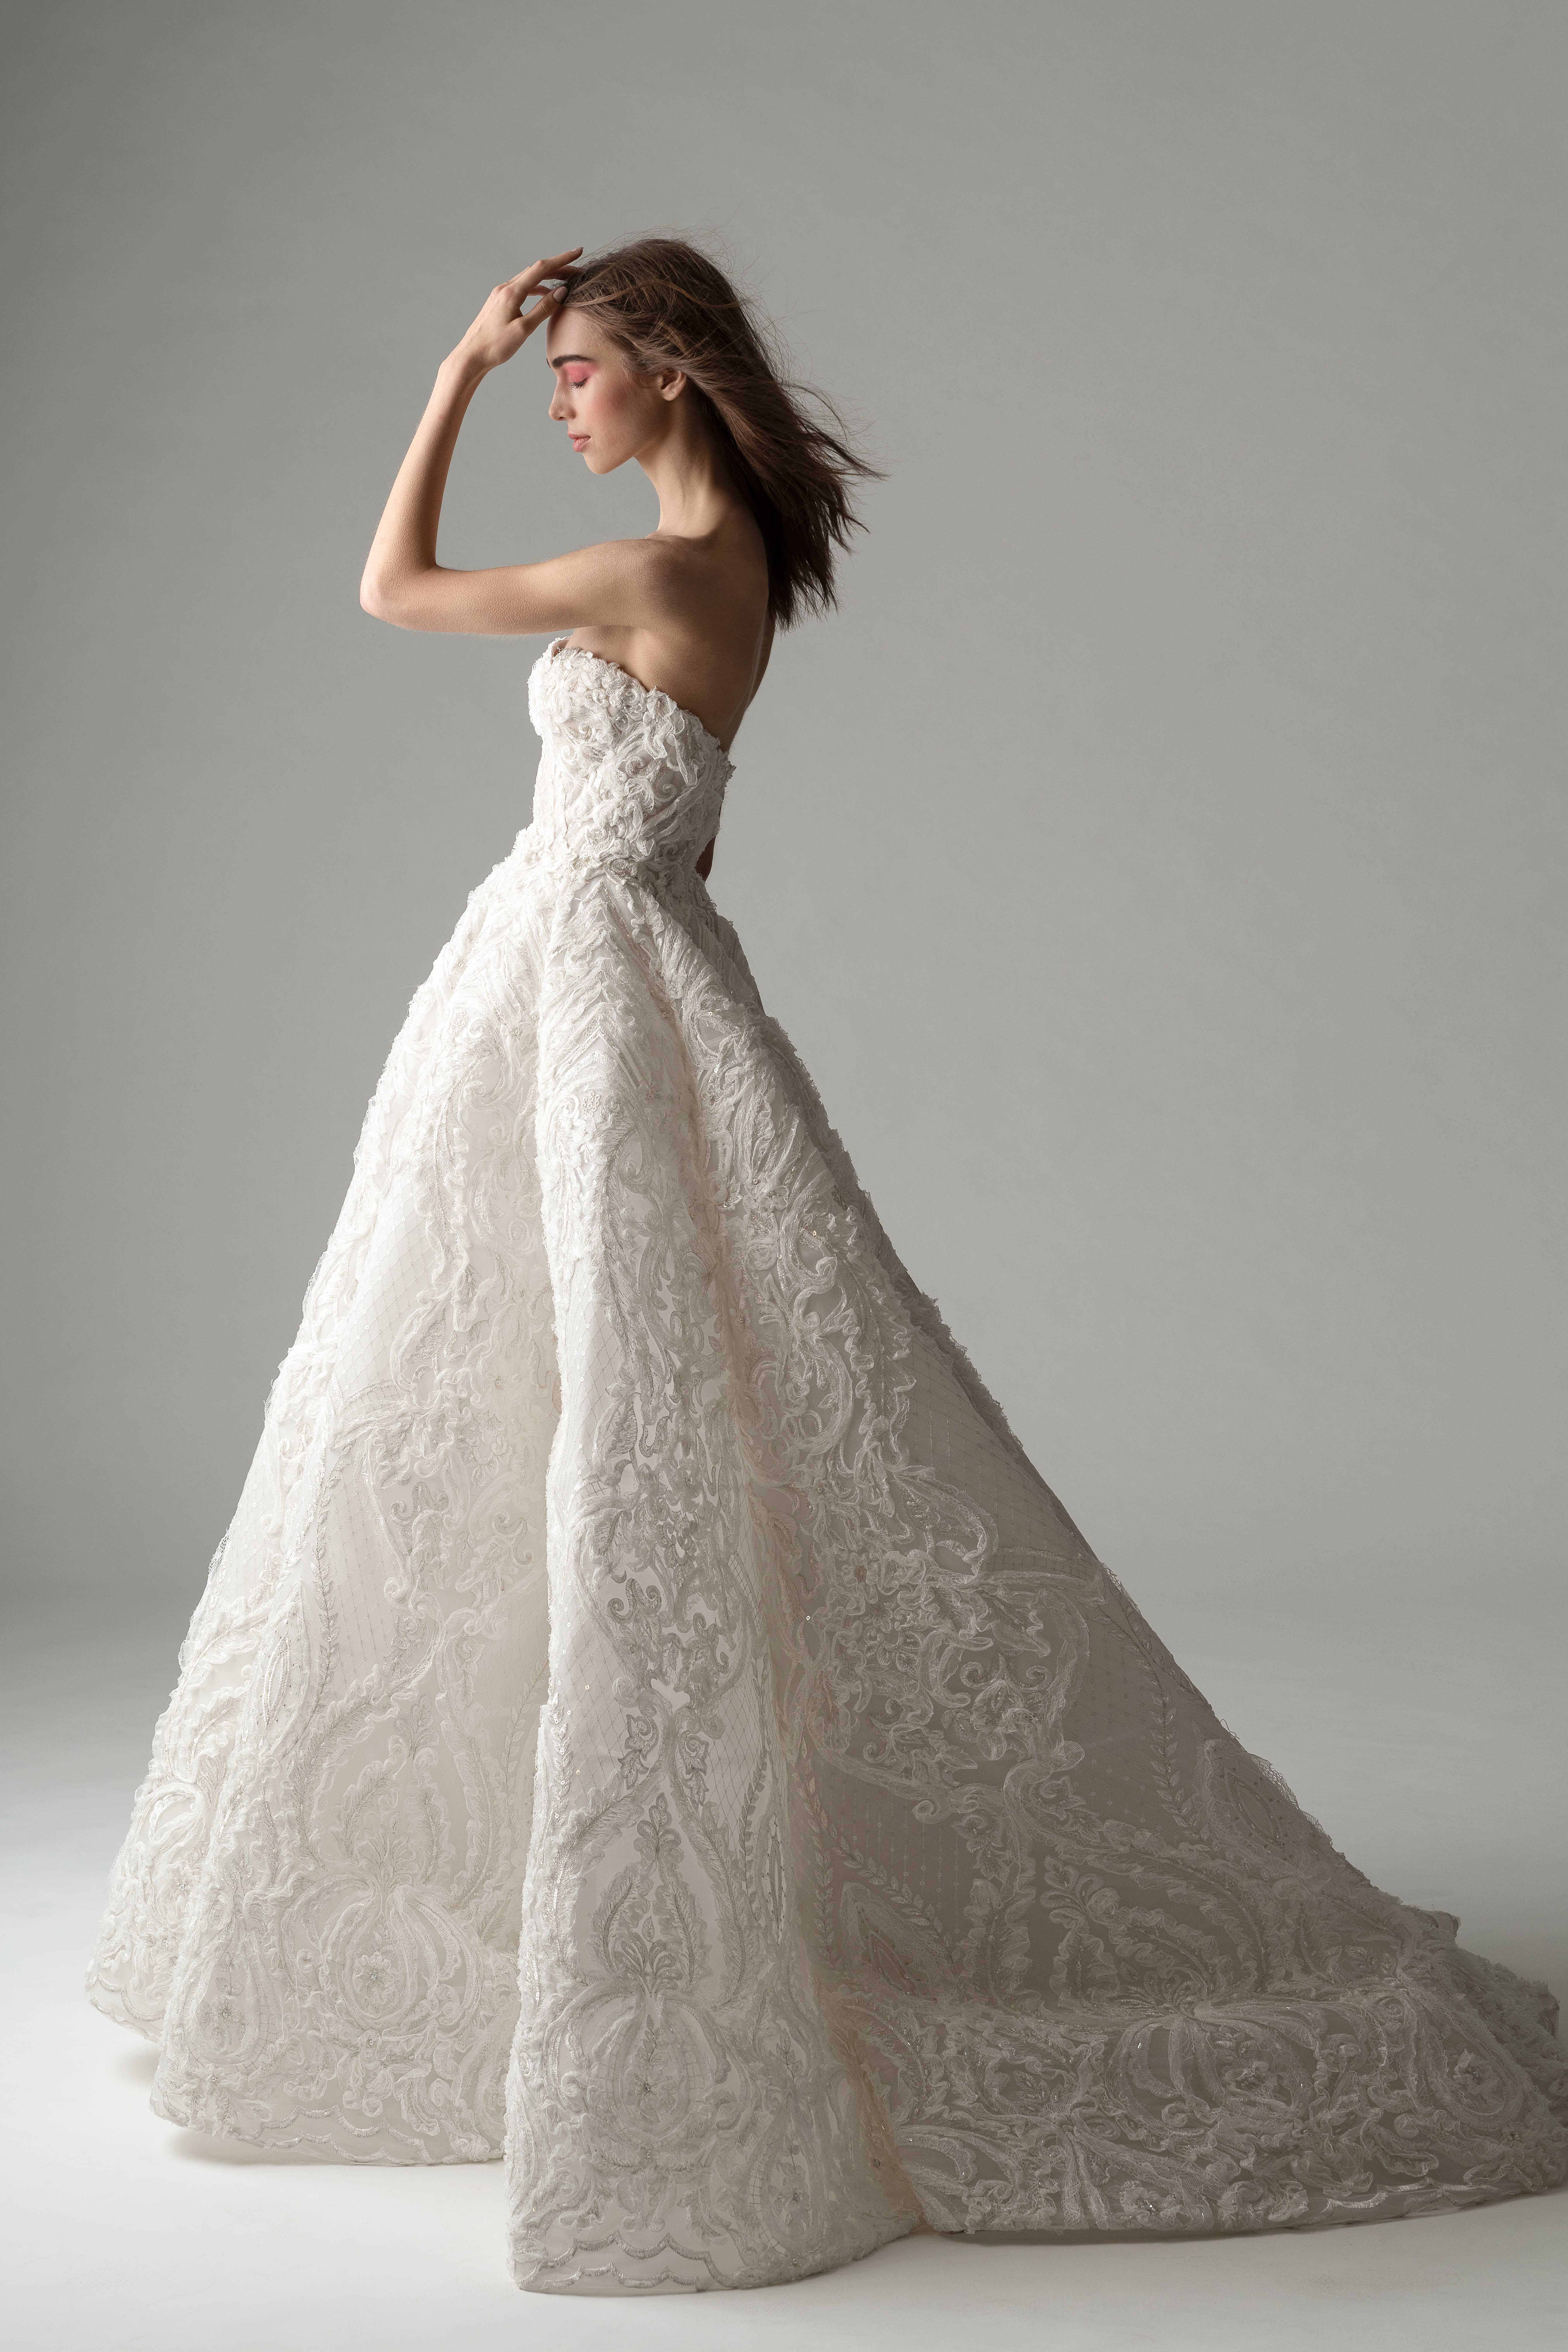 rivini by rita fall 2019 strapless floral applique a-line wedding dress